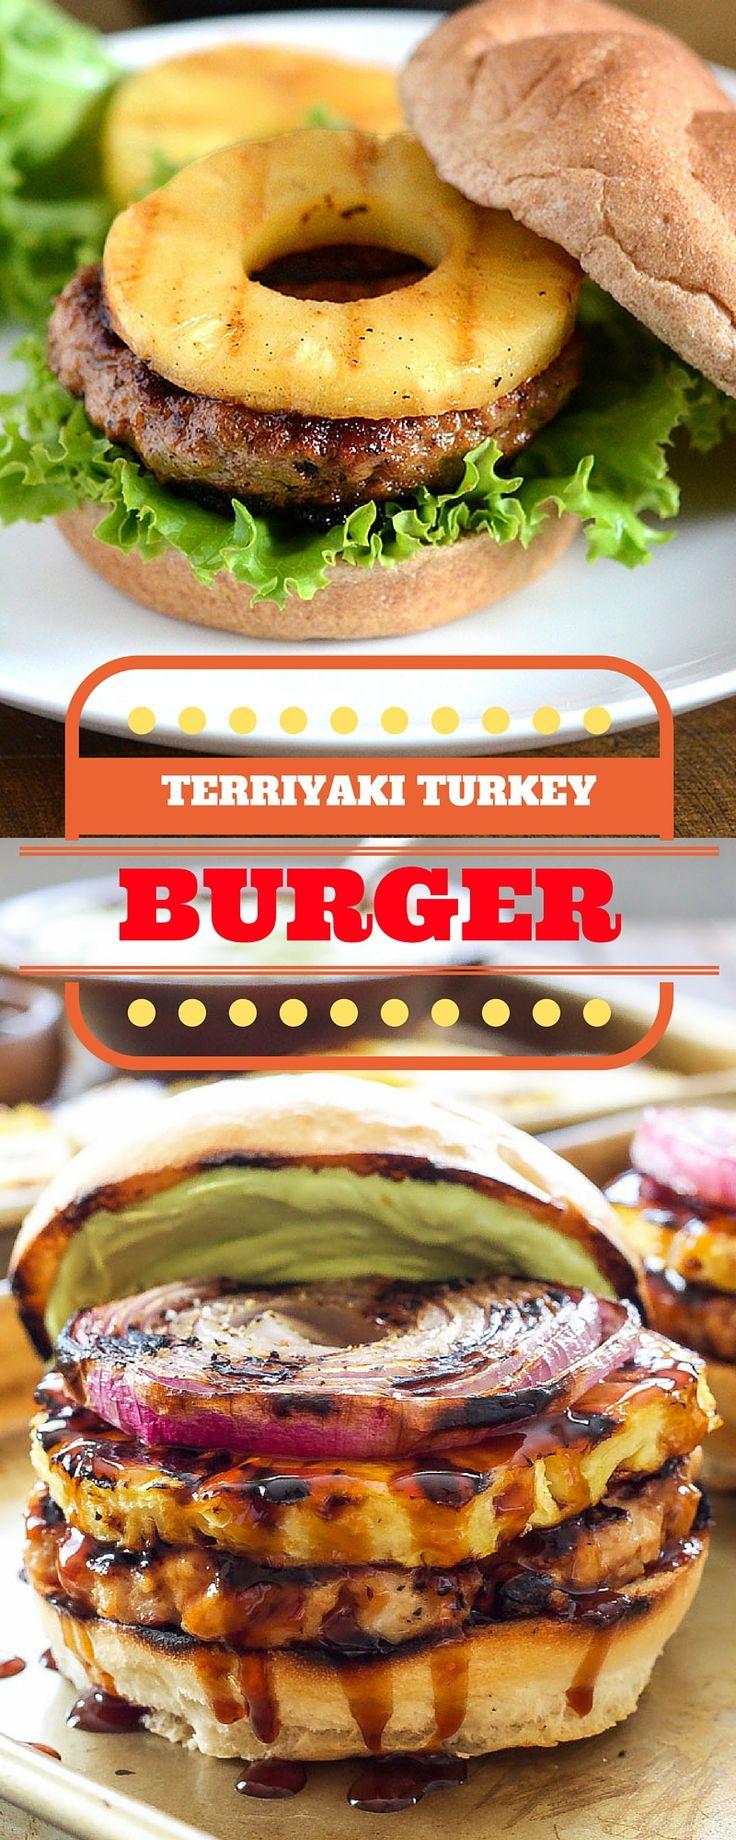 Grill Lovers' Teriyaki Turkey Burgers Recipe Ingredients• 1 pound lean ground turkey • 2 Tbls. fresh ginger, minced • 1 egg • 1 cup panko bread crumbs • pinch Kosher salt • 1/2 cup chunky teriyaki sauce • 4 slices pineapple • green leaf lettuce • 4 hamburger rolls InstructionsPreheat the grill to medium heat.[...]